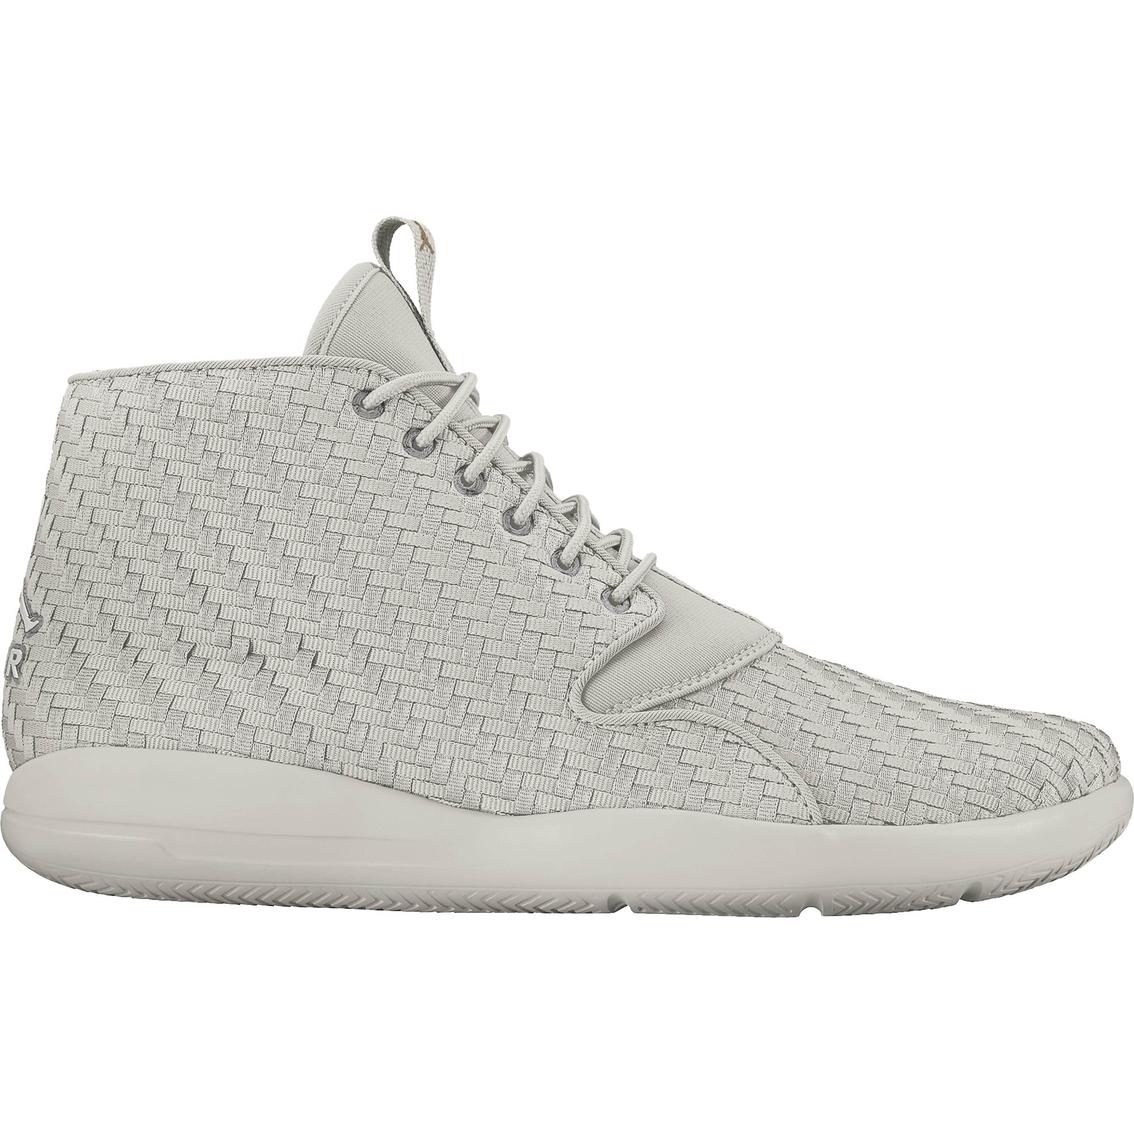 52be4215c97ad1 Jordan Men s Eclipse Chukka Shoes